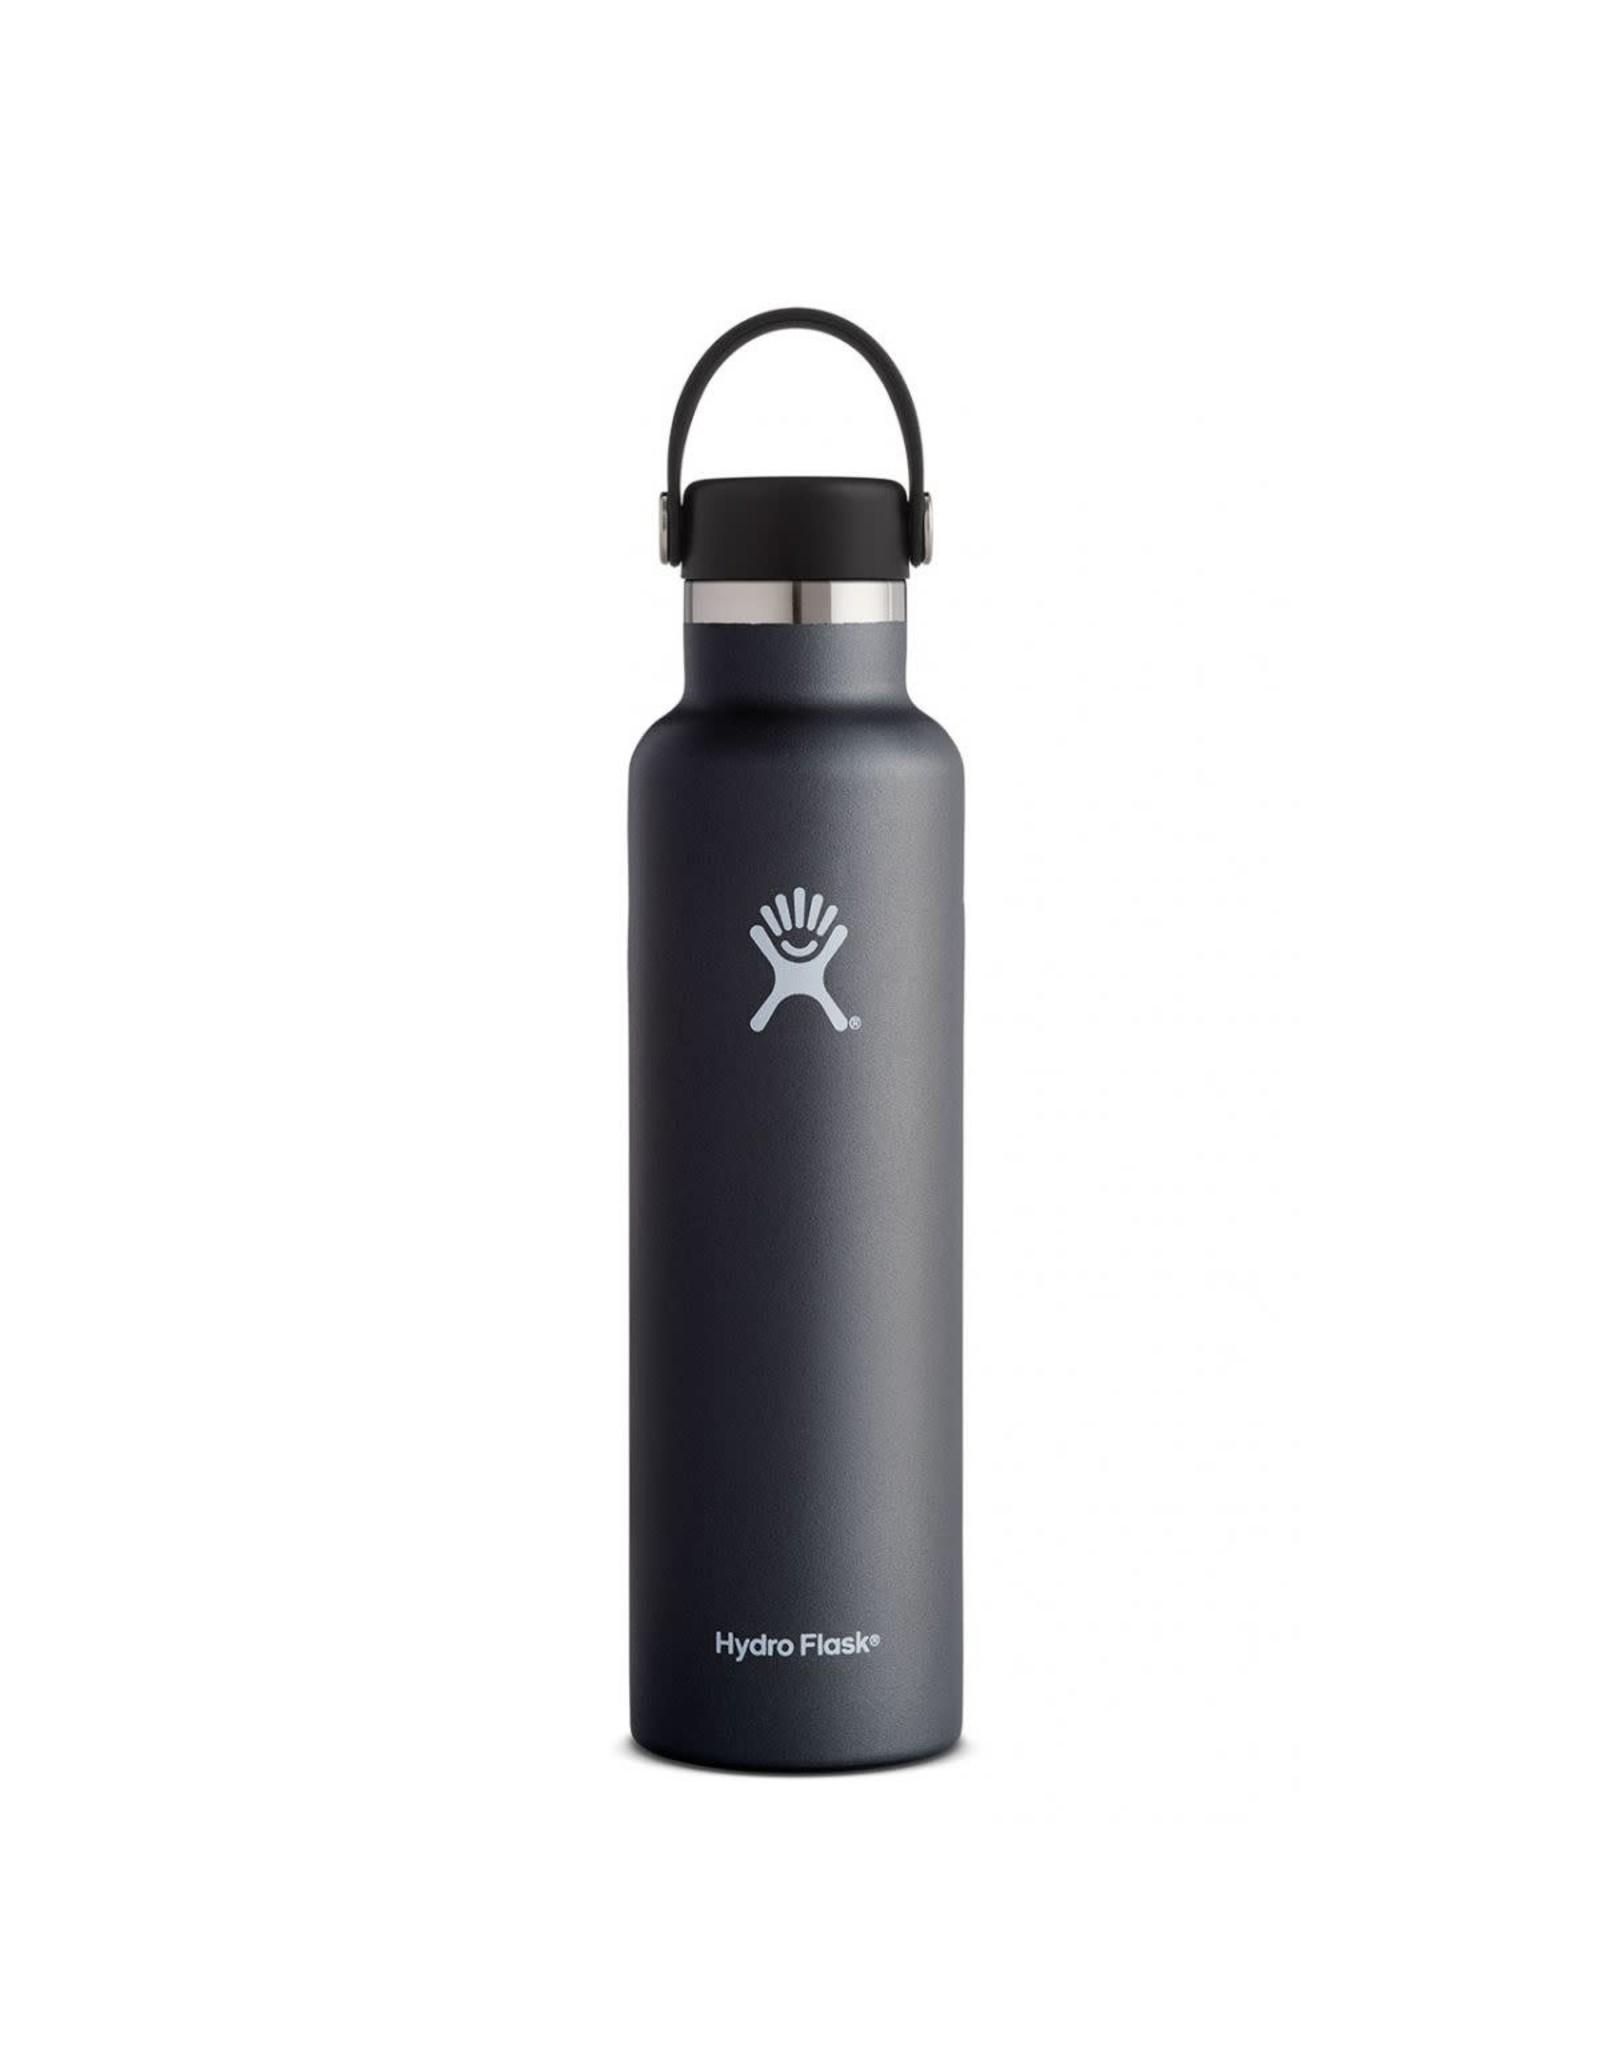 Hydro Flask Hydro Flask 24oz Standard Mouth w/ Flex Cap Black